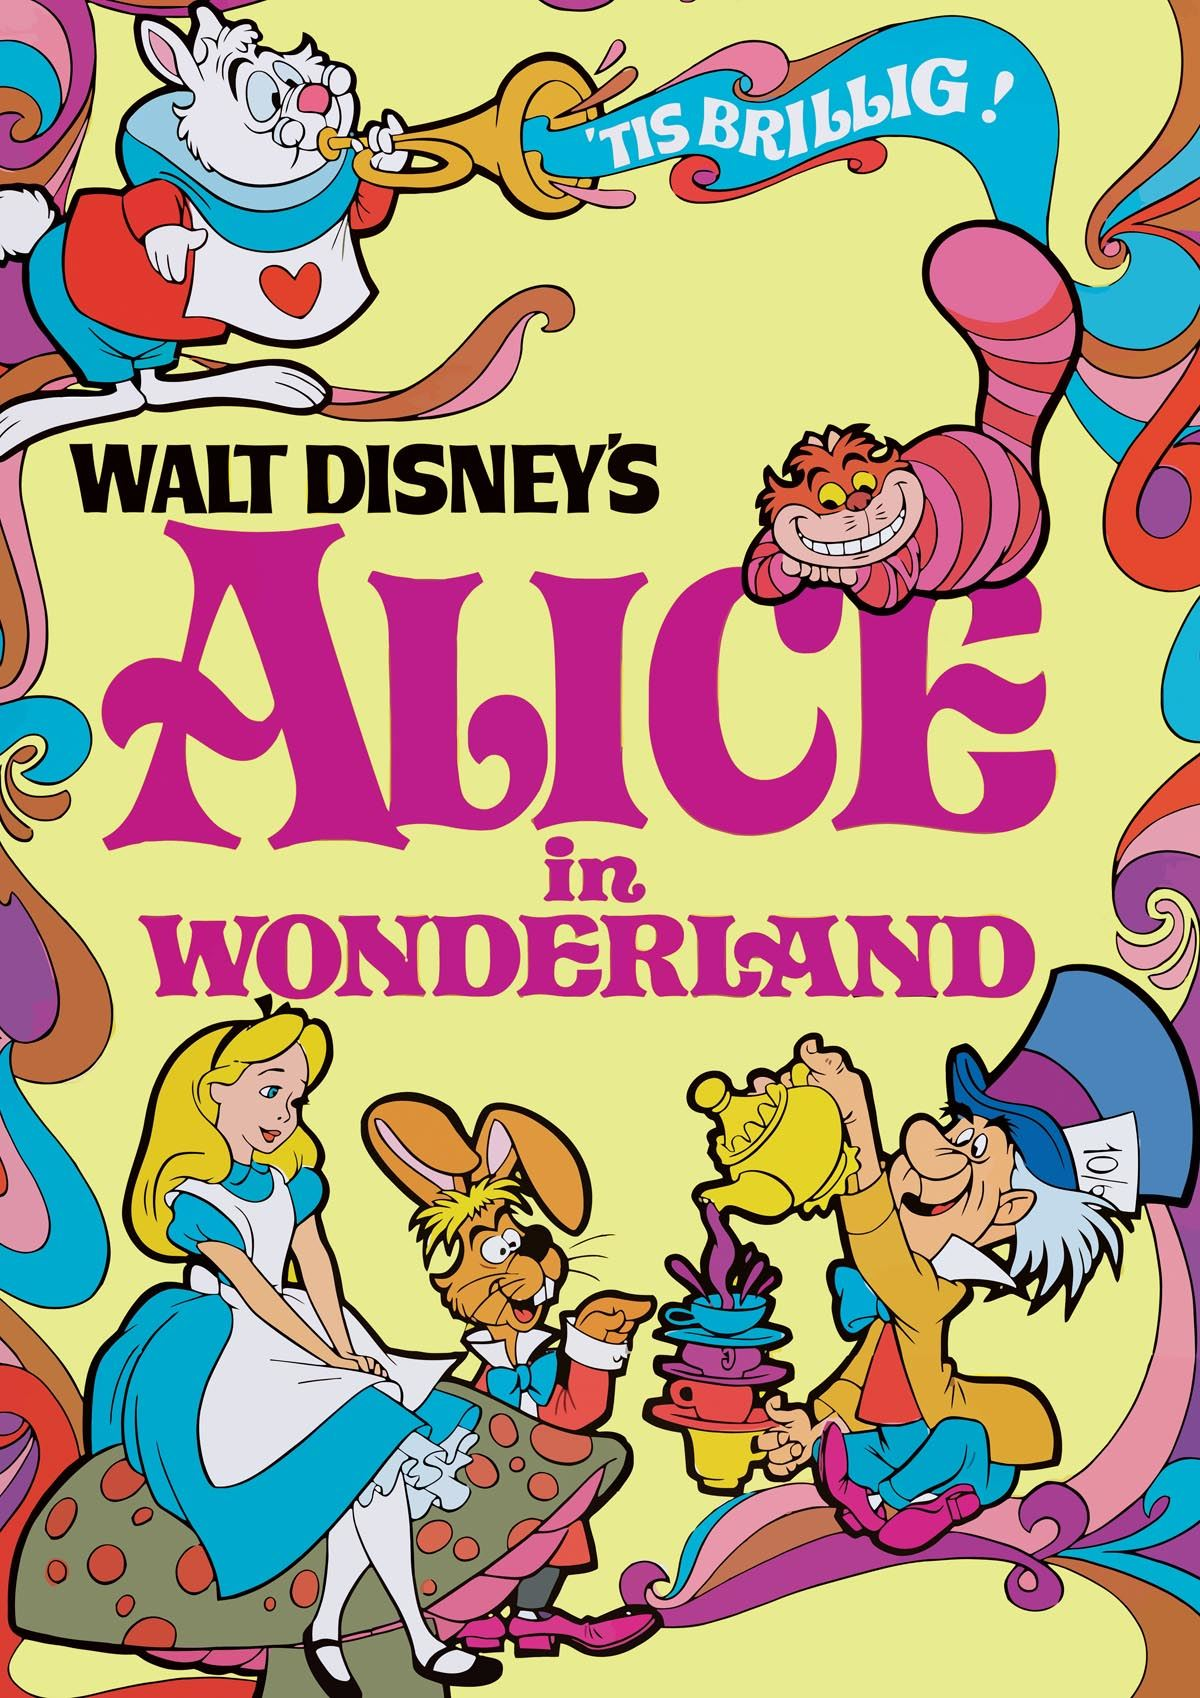 DISNEY ALICE IN WONDERLAND A3 ART PRINT POSTER YF5156   eBay